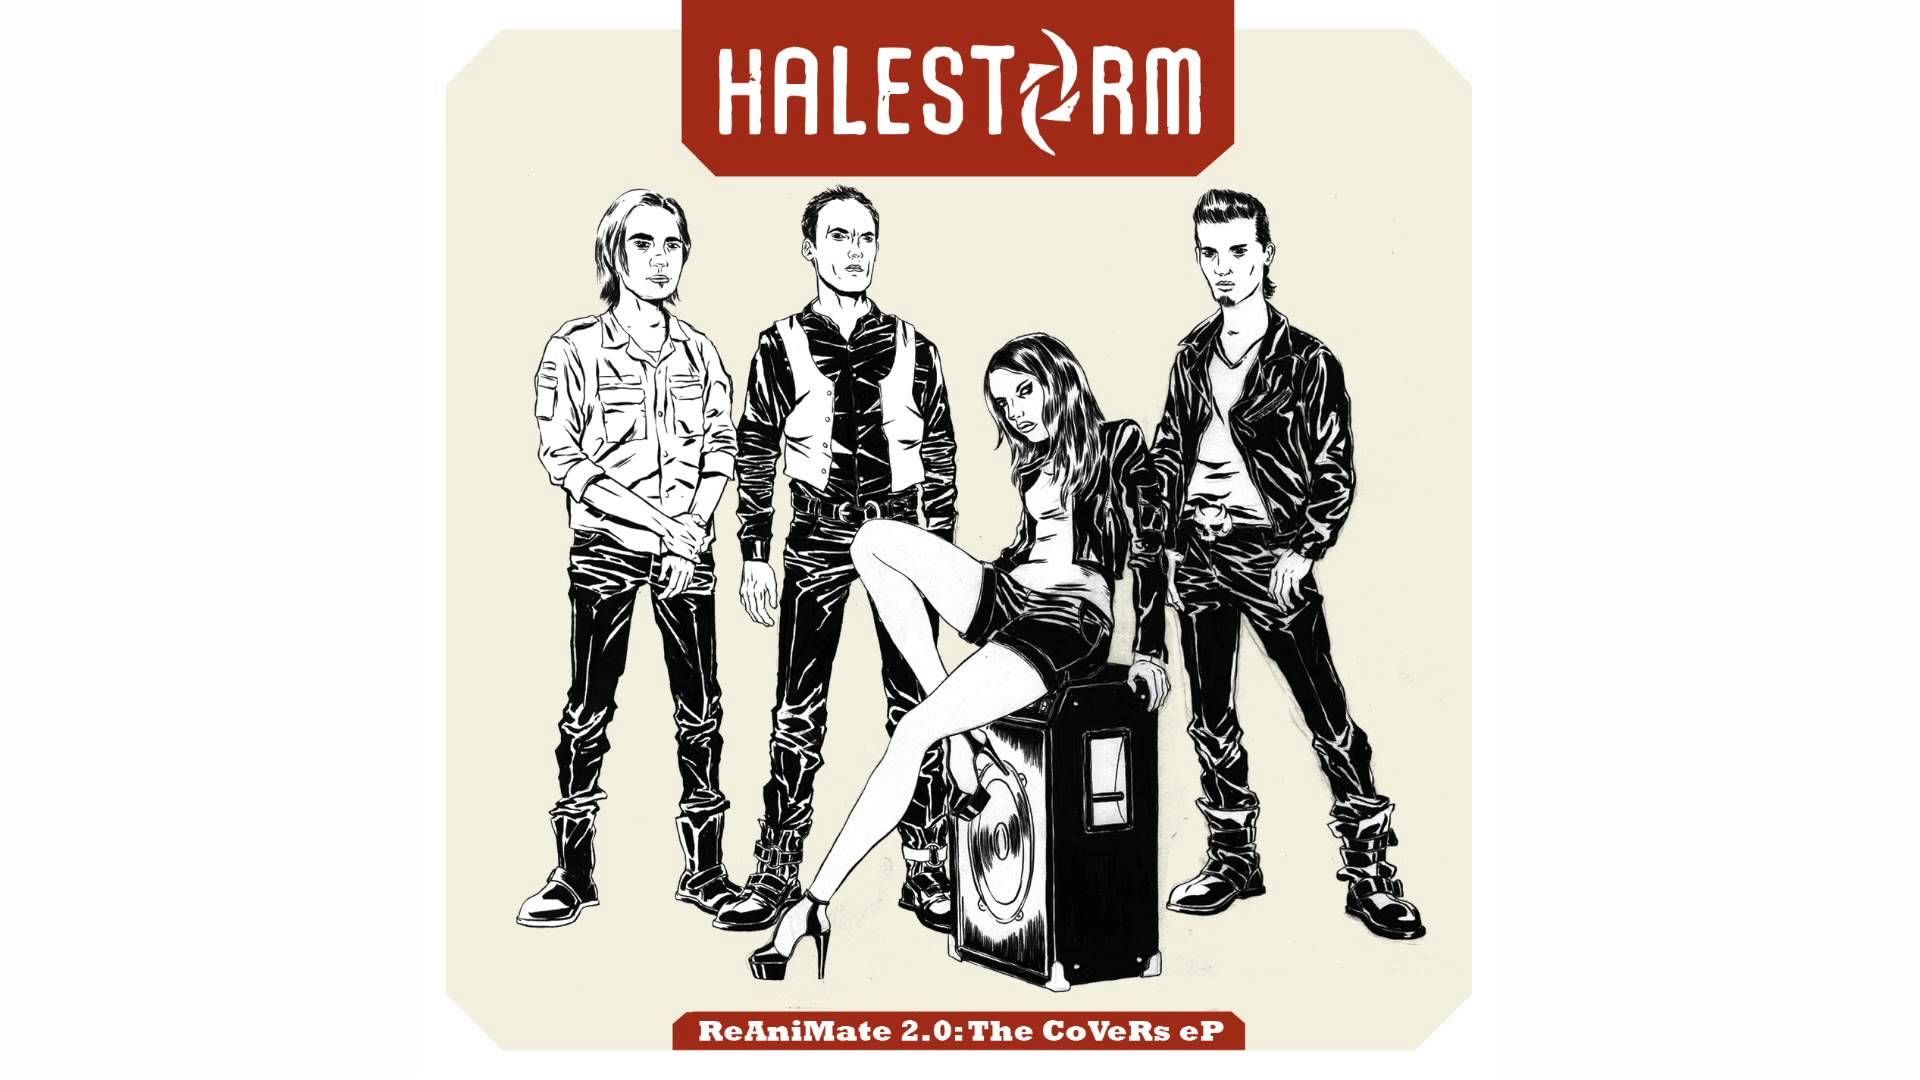 Halestorm Get Lucky Daft Punk Cover OFFICIAL AUDIO - Songs like get lucky daft punk popular